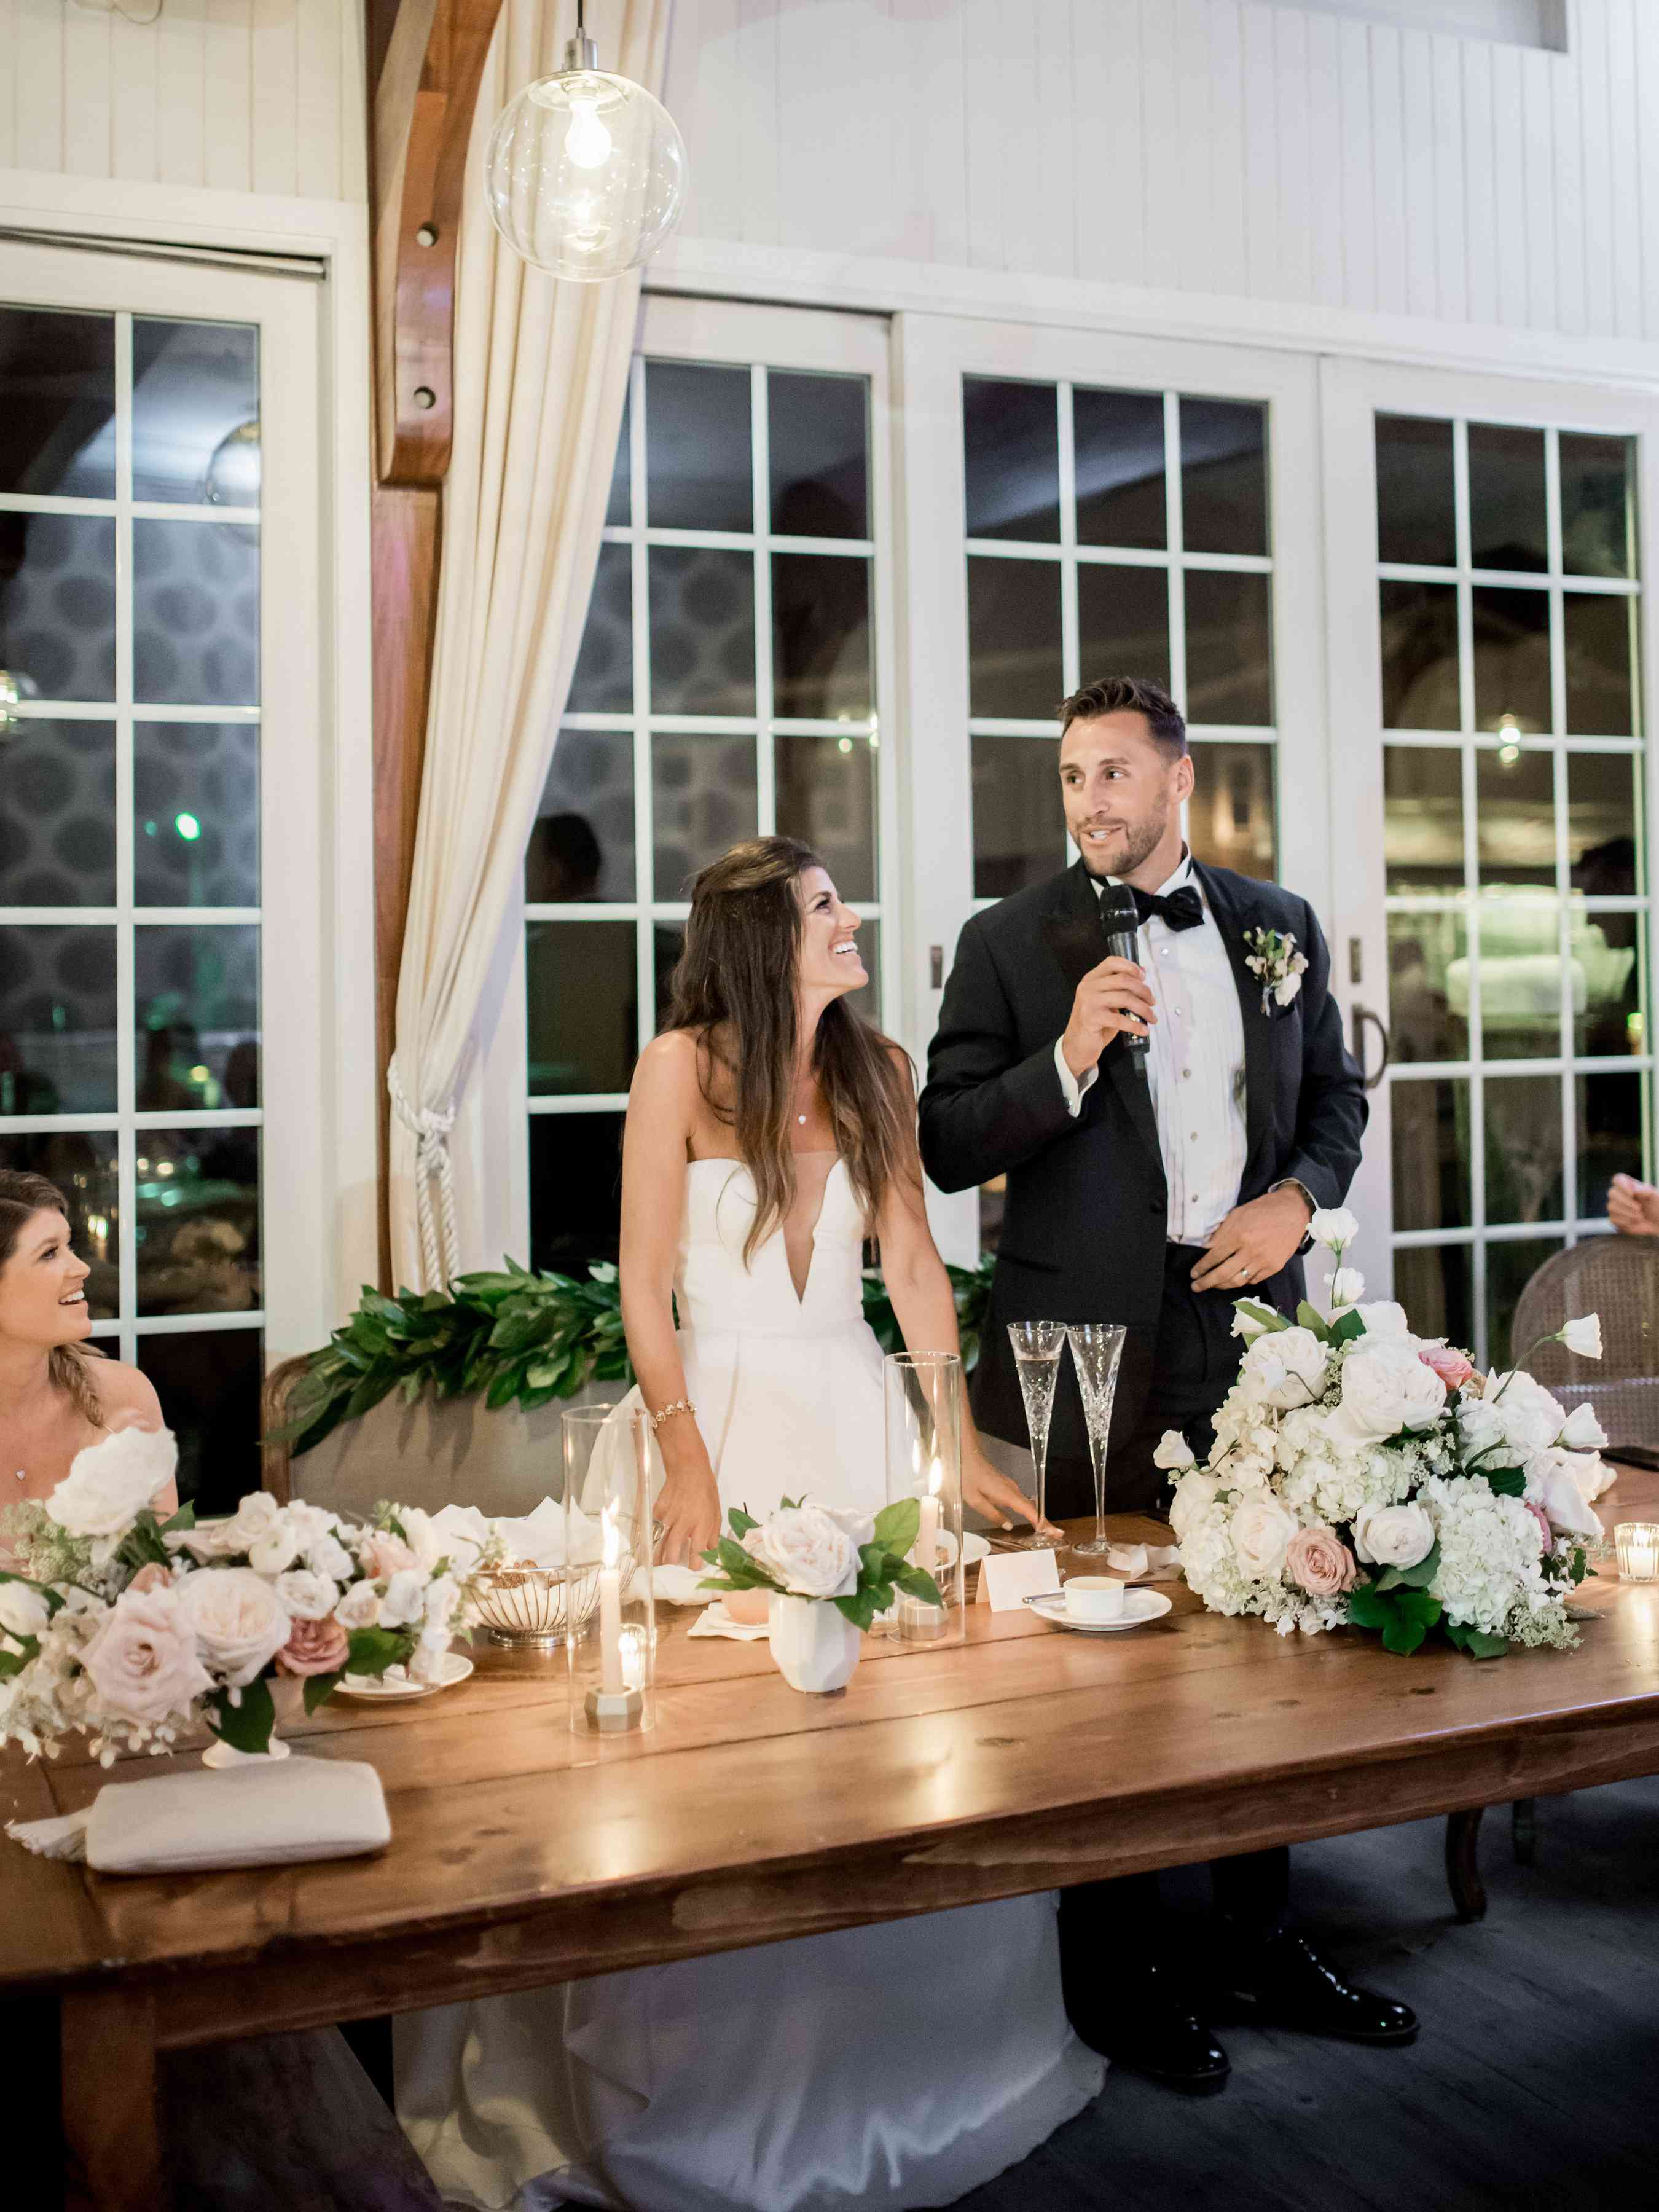 toasting at a wedding